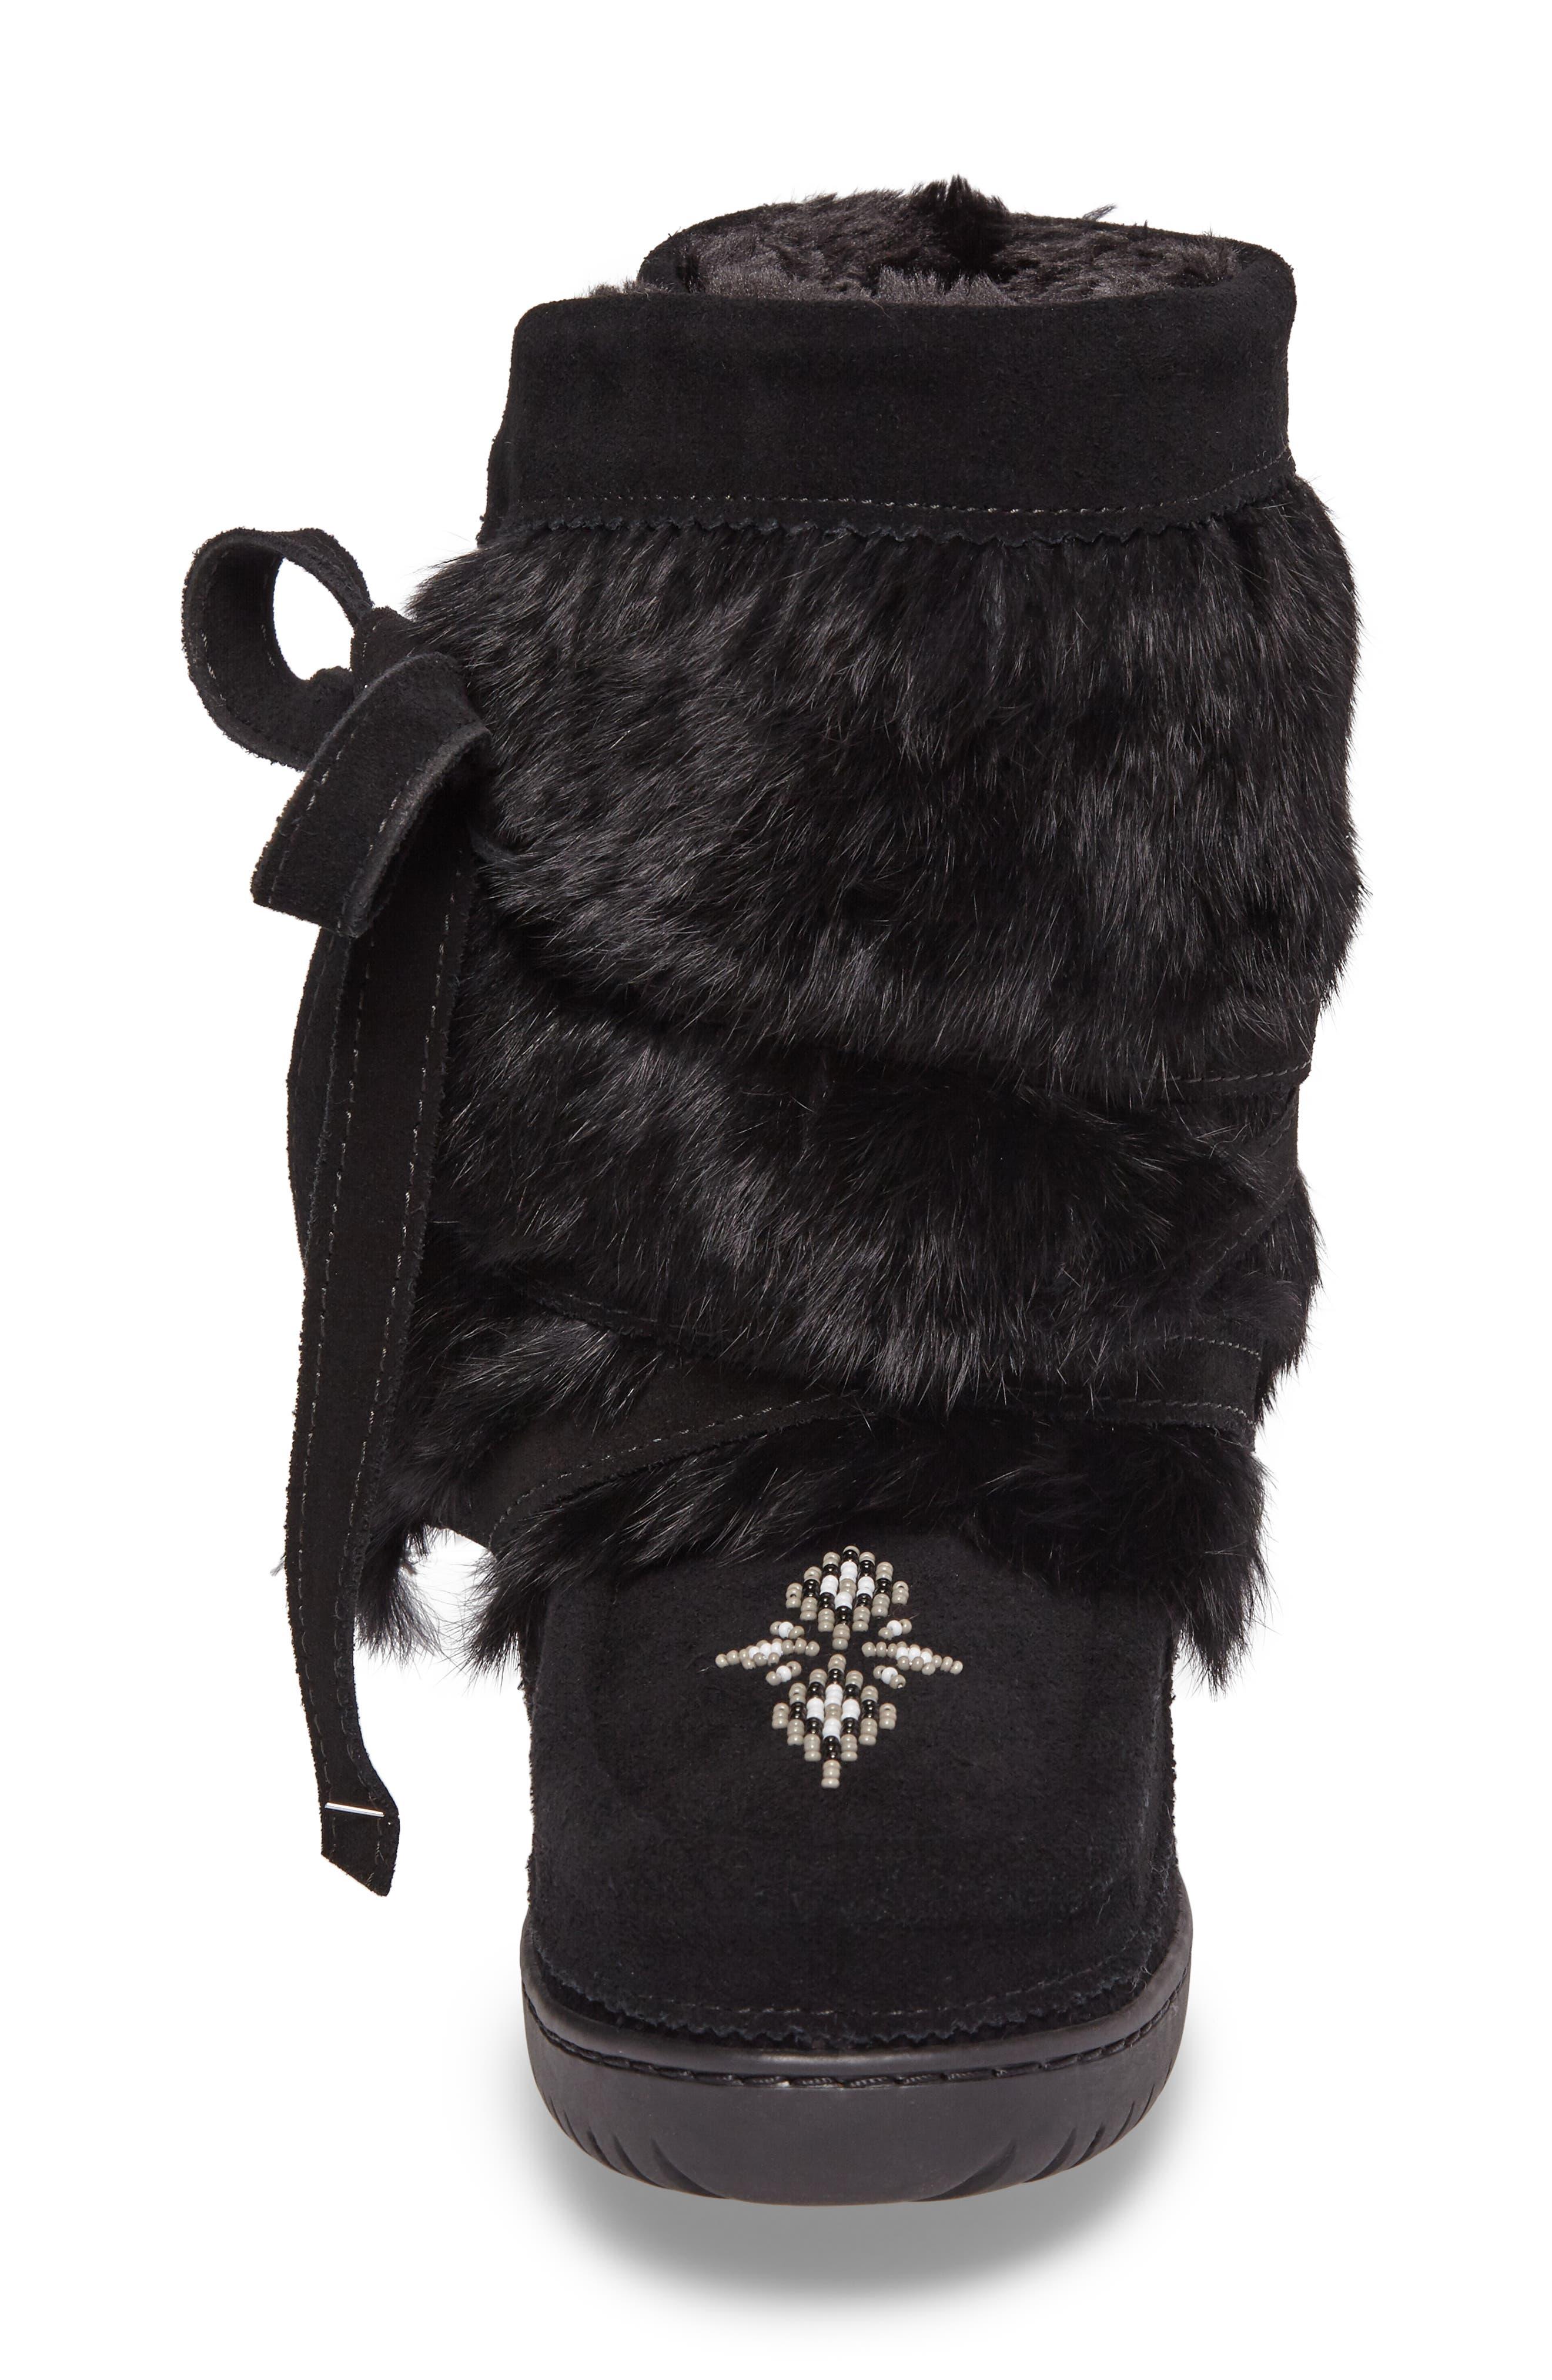 Beaded Short Wrap Genuine Rabbit Fur & Shearling Boot,                             Alternate thumbnail 7, color,